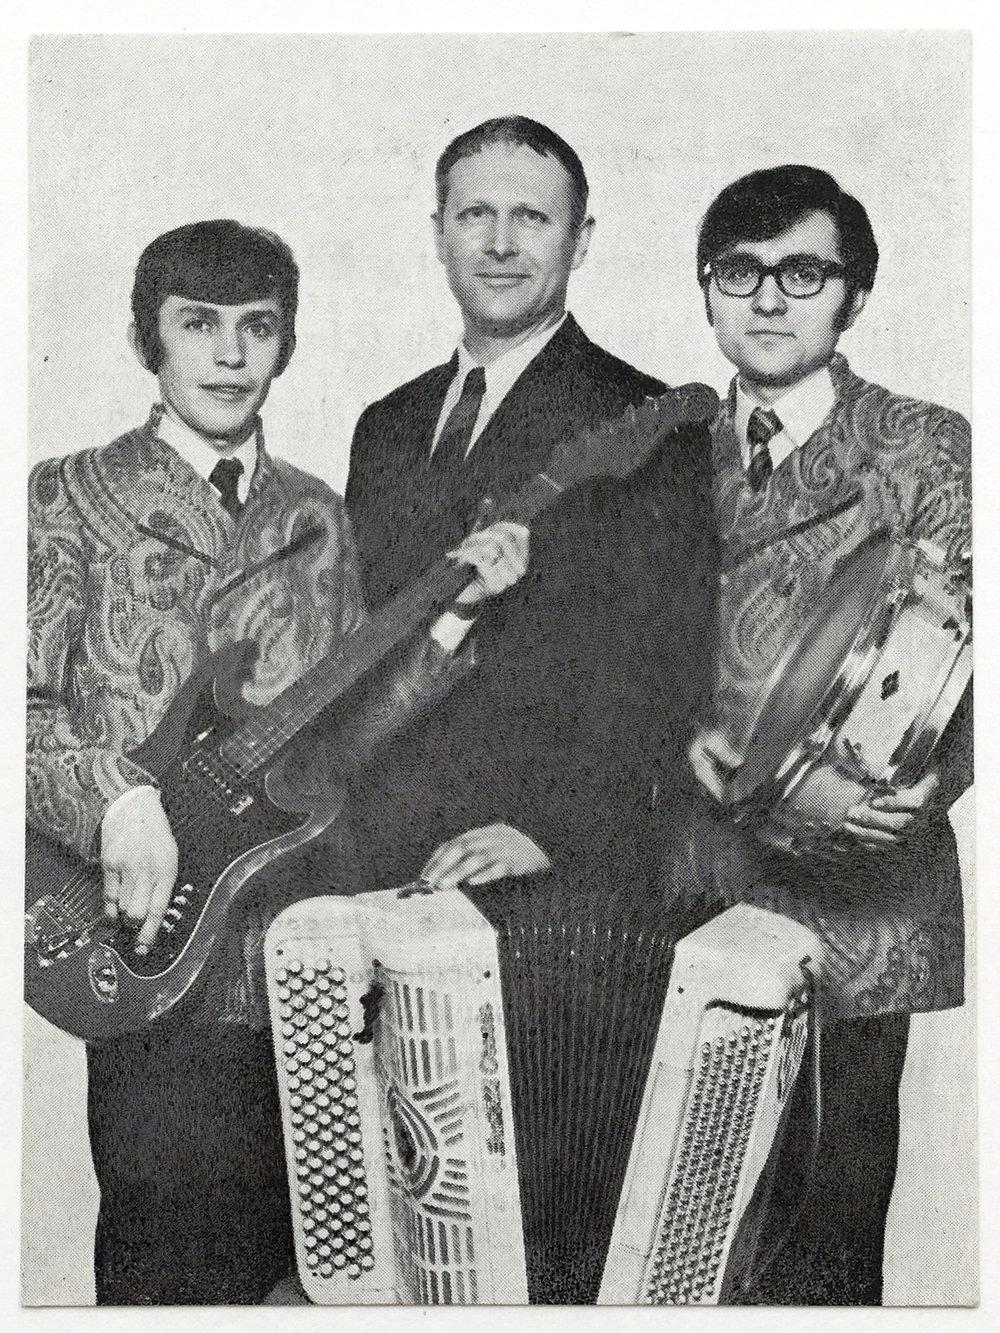 Raoul.music.accordeon.guédon.01.jpg